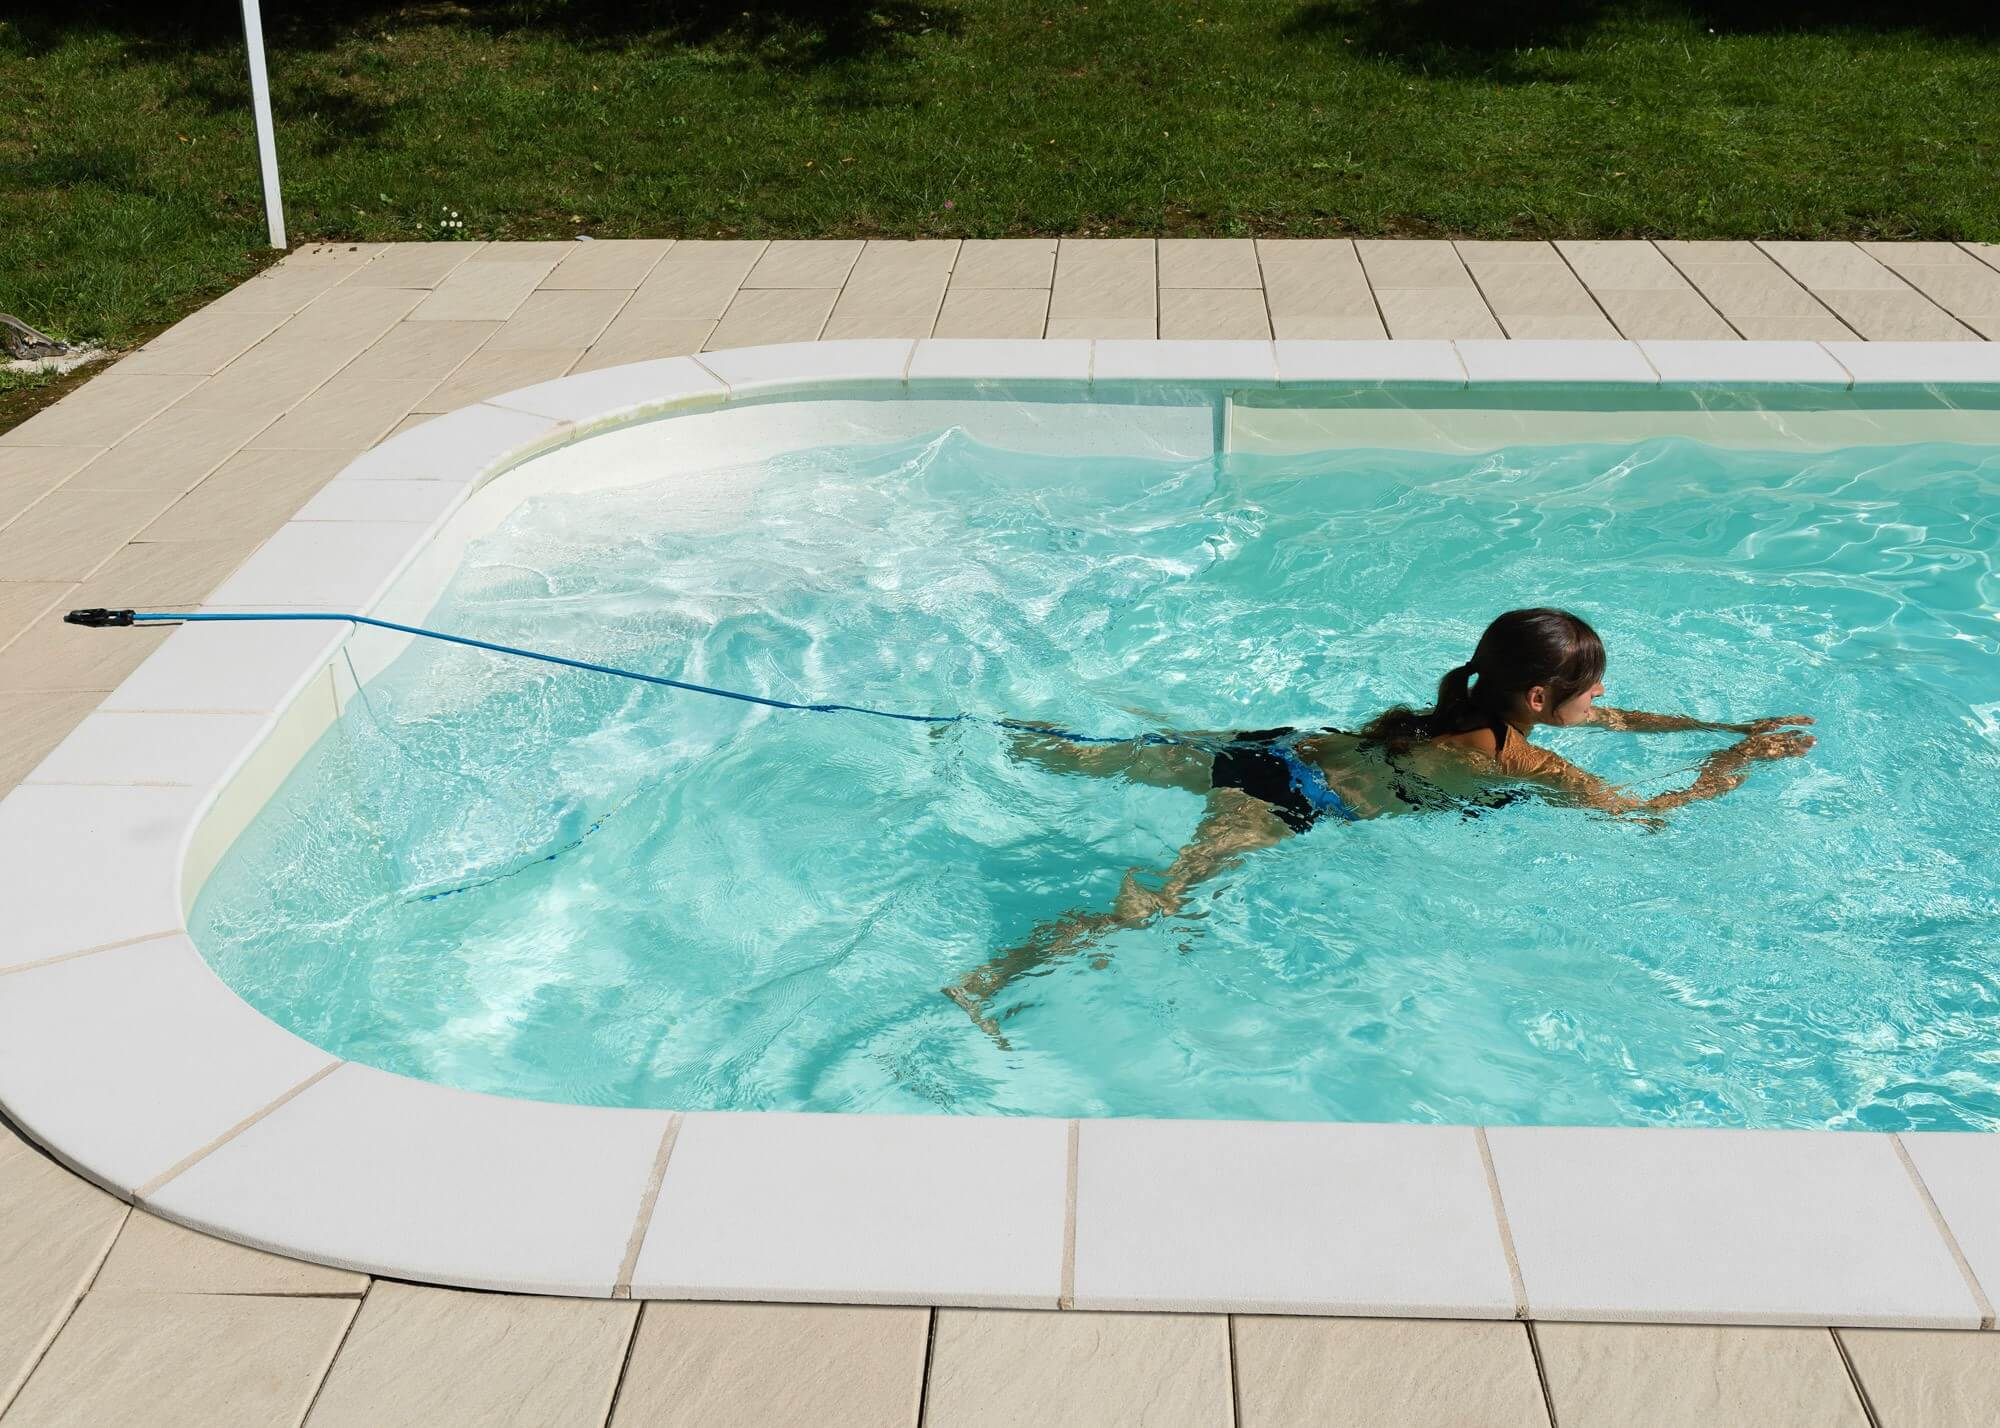 elastique de nage piscines waterair. Black Bedroom Furniture Sets. Home Design Ideas